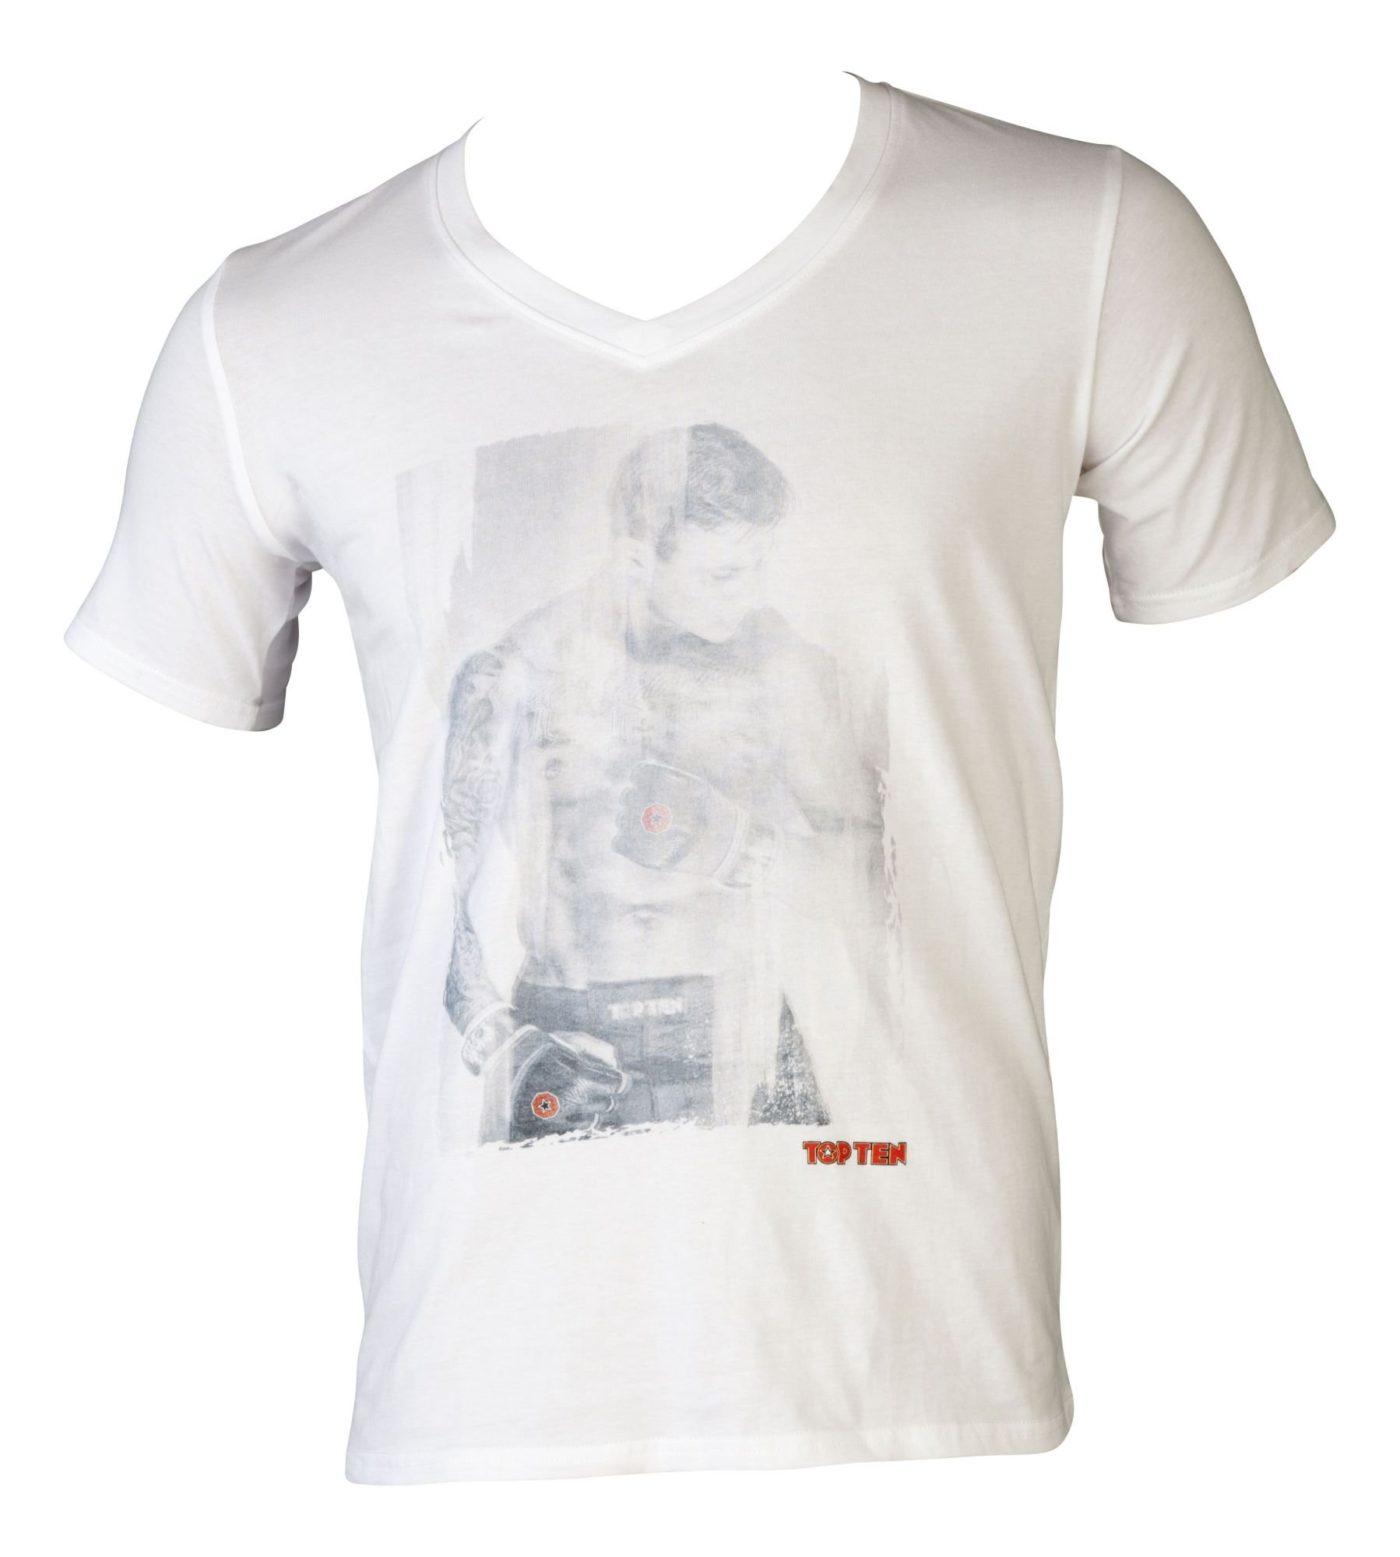 "TOP TEN T-Shirt V-Hals ""MMA Fighter"" Wit"